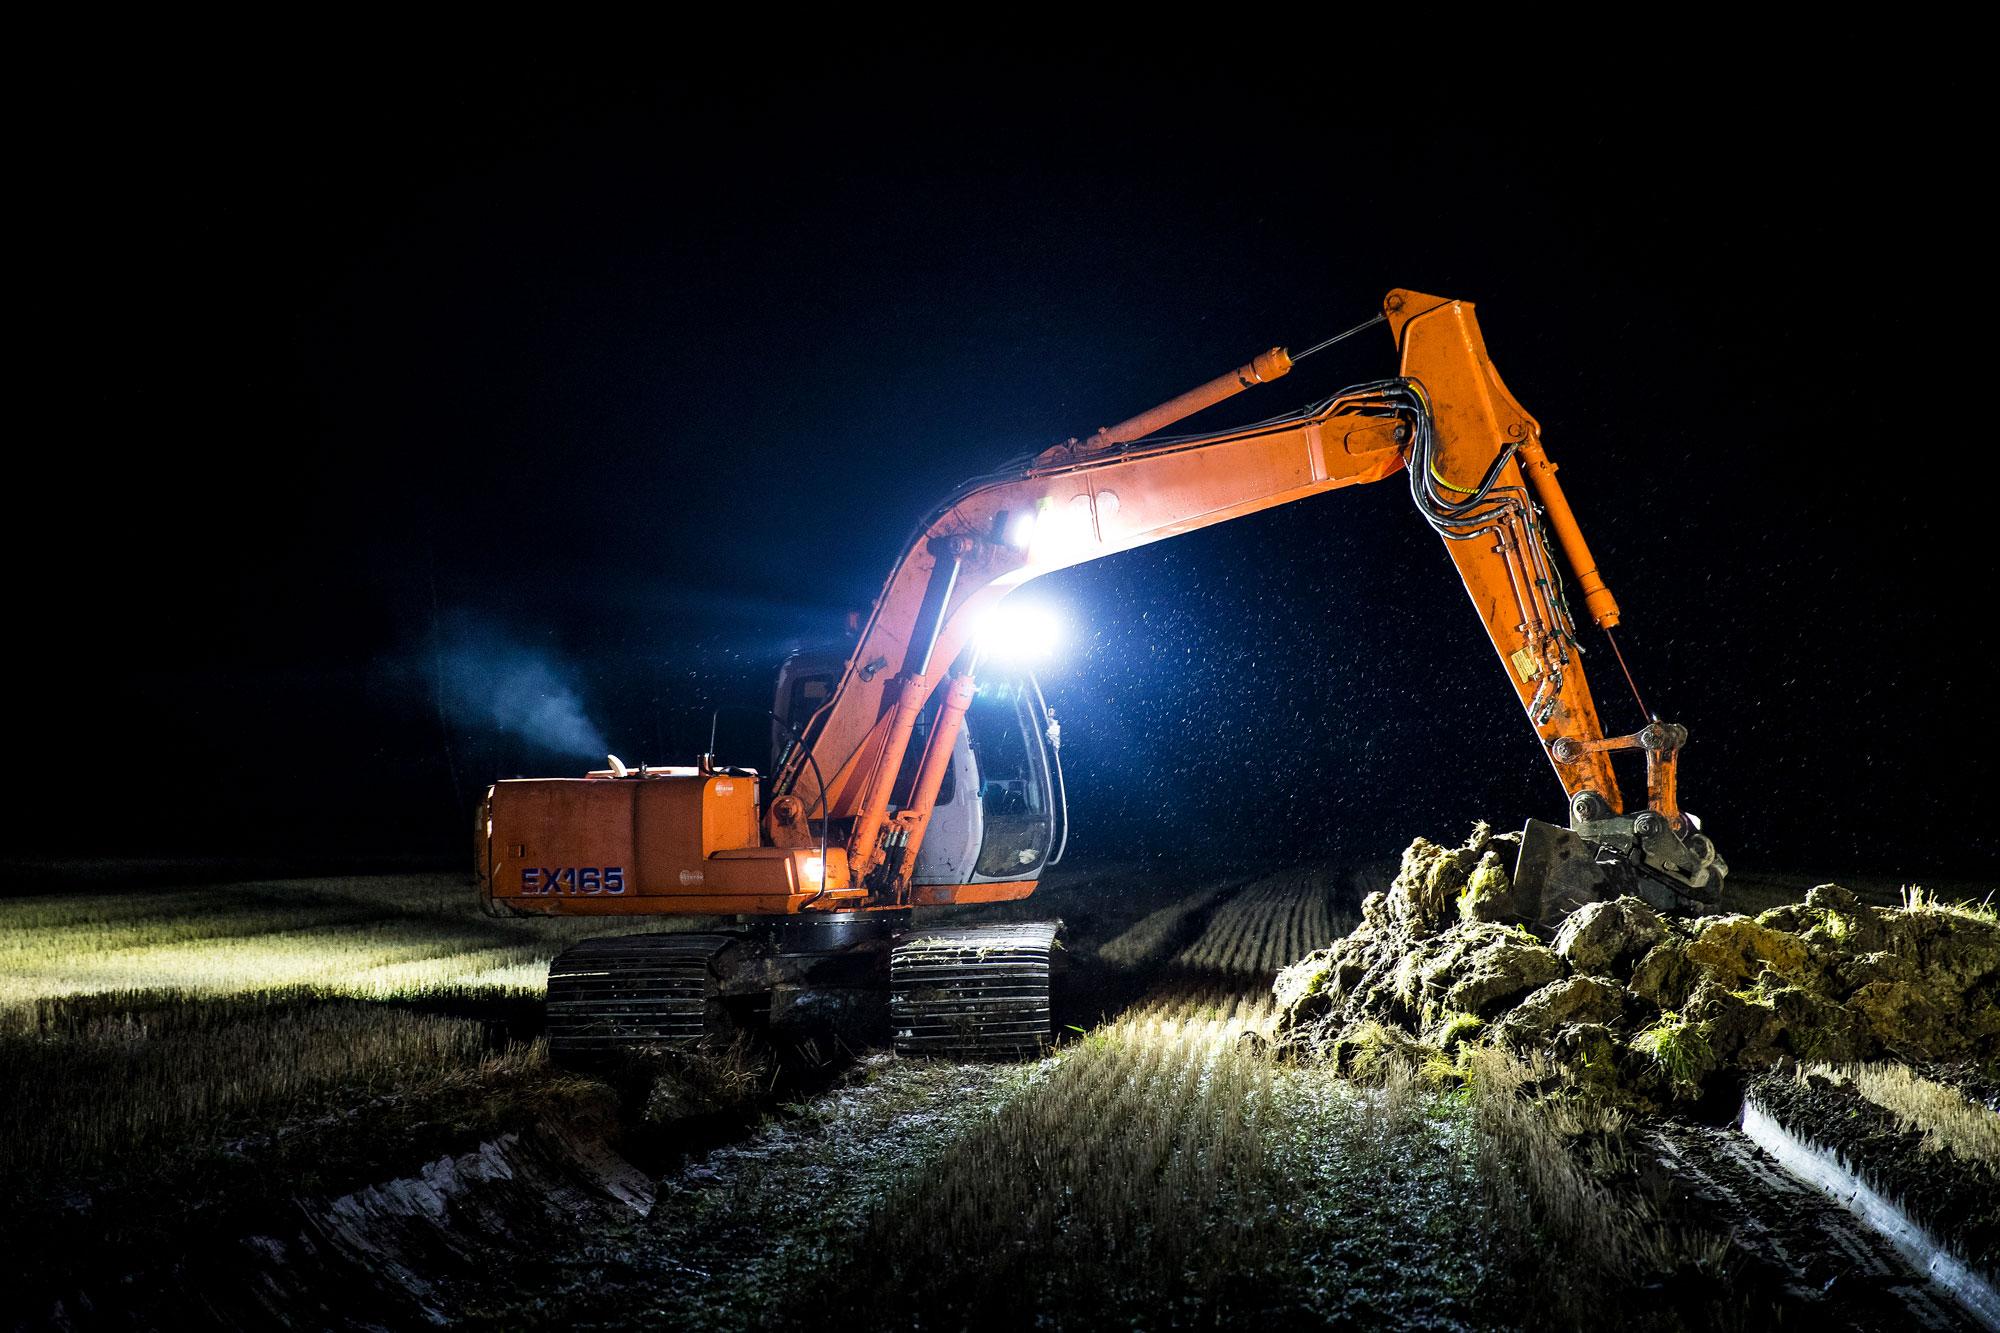 Excavator Lights: All about LED Excavator work lights - NORDIC LIGHTS®